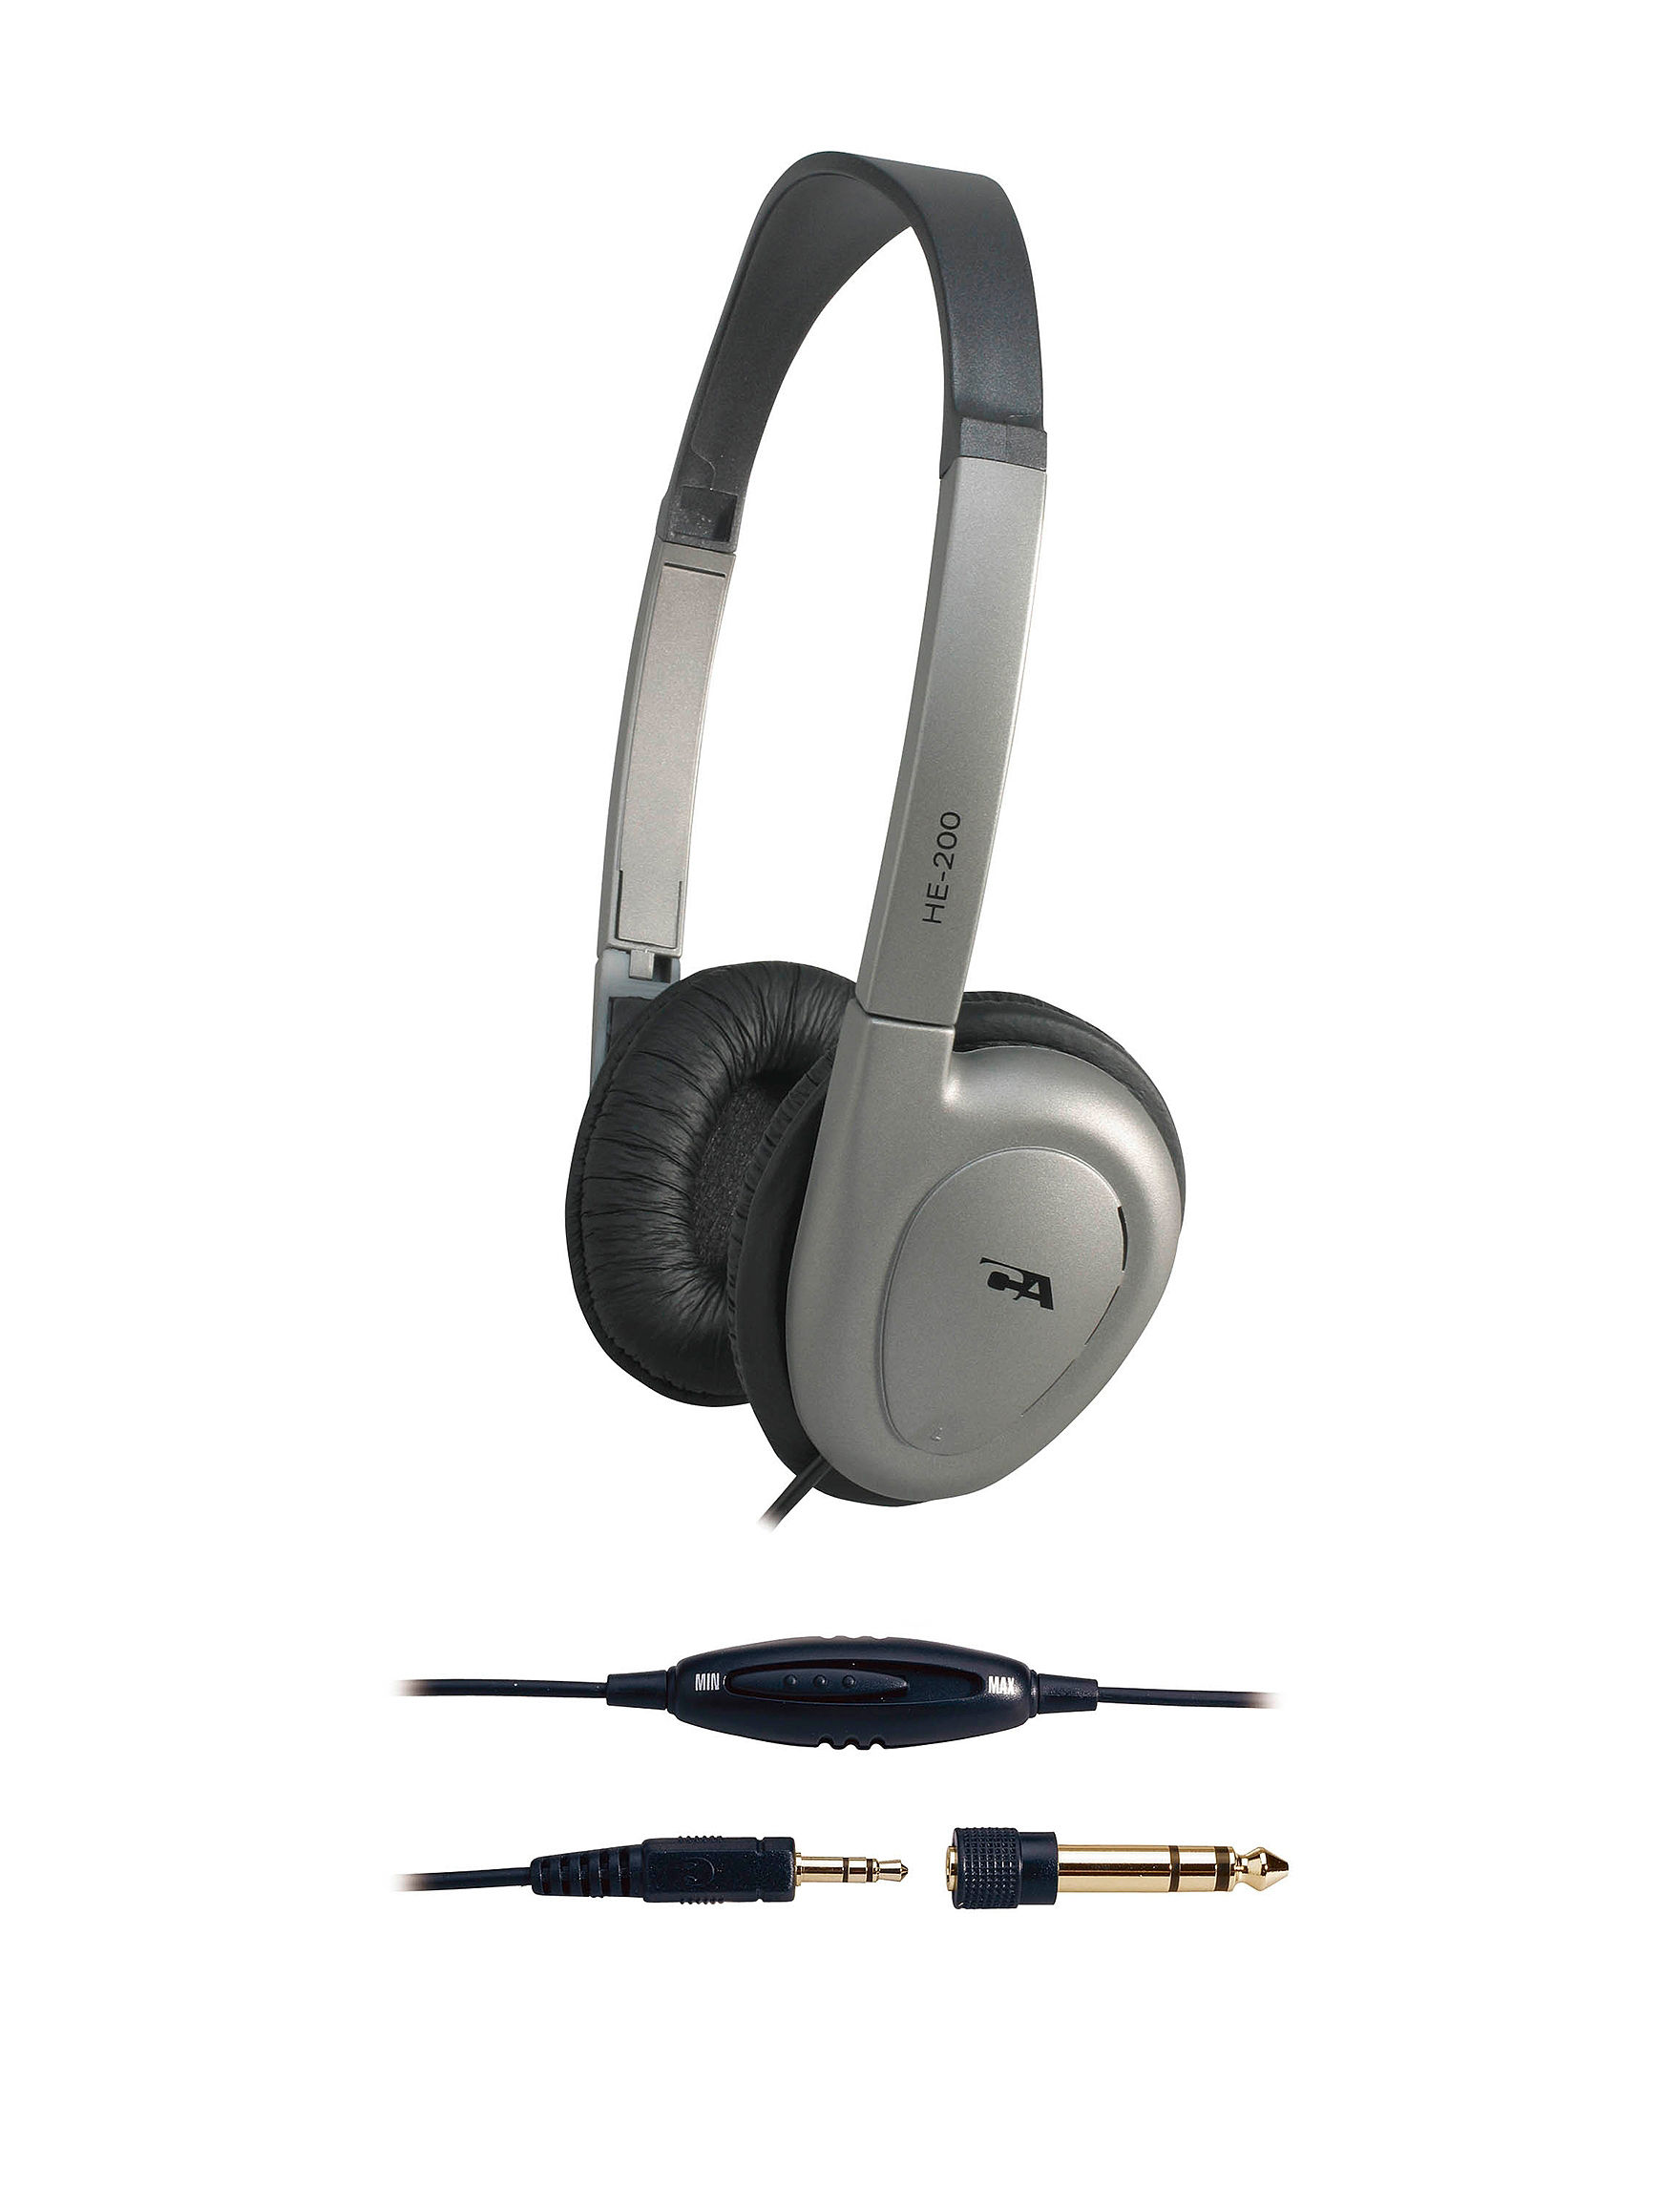 Cyber Acoustics Grey Headphones Home & Portable Audio Tech Accessories